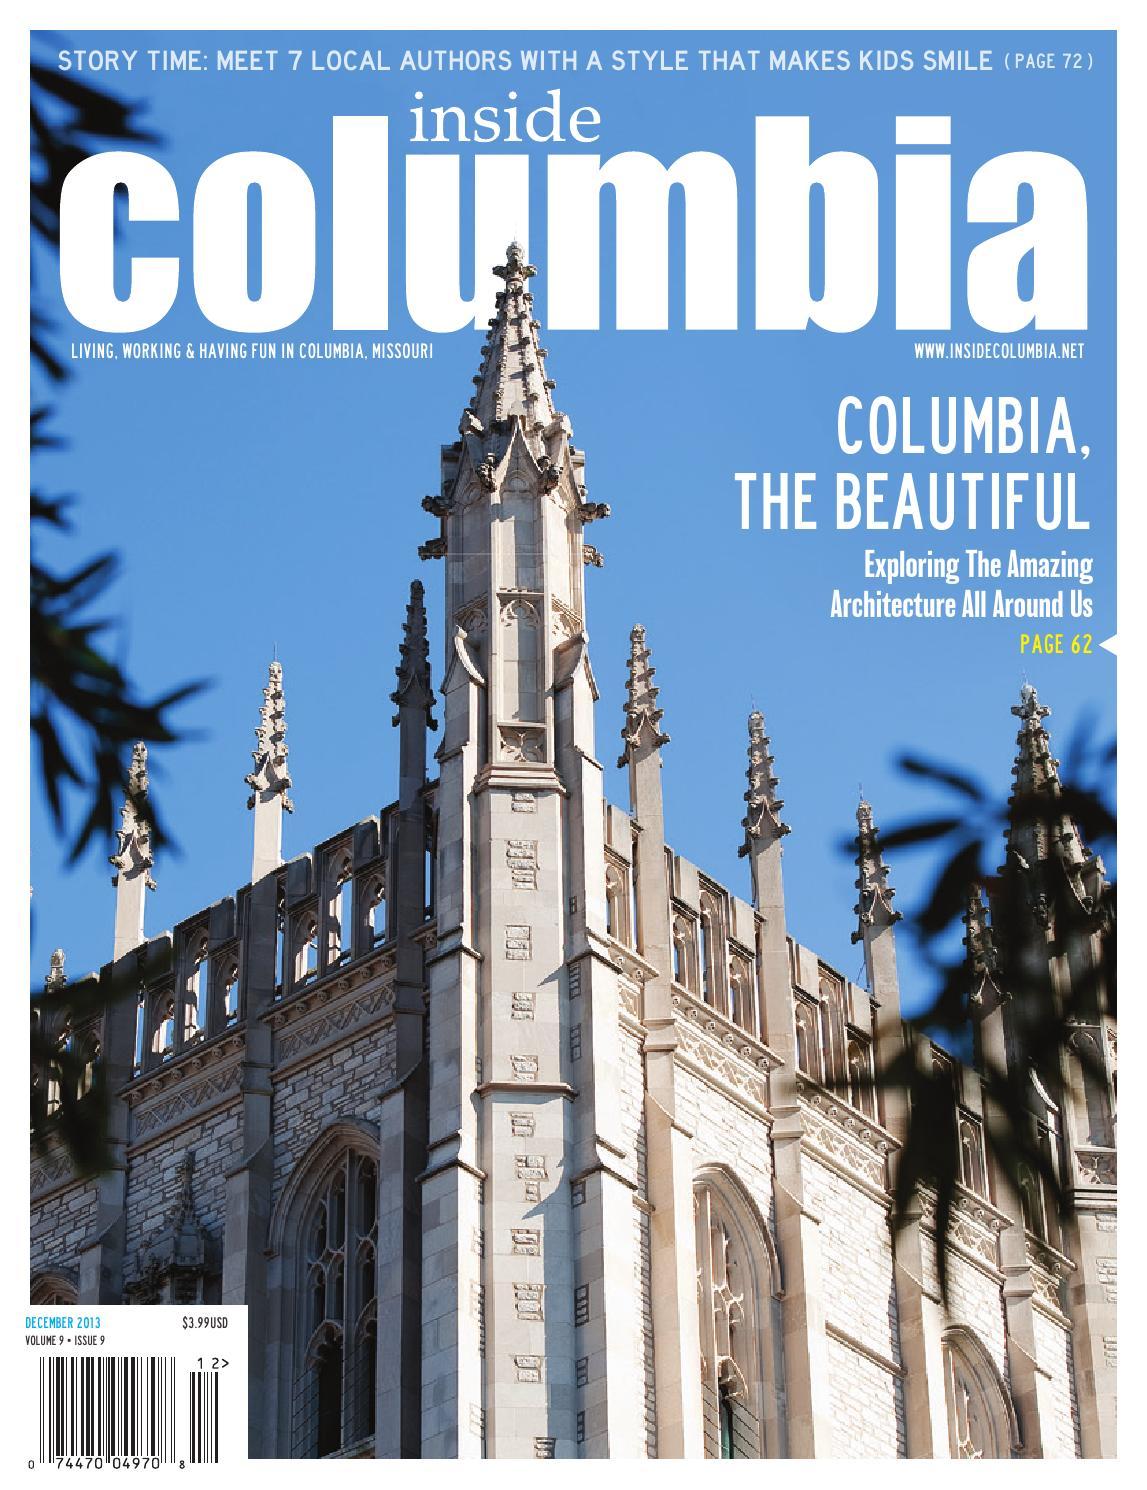 Inside Columbia December 2013 by Inside Columbia Magazine - issuu